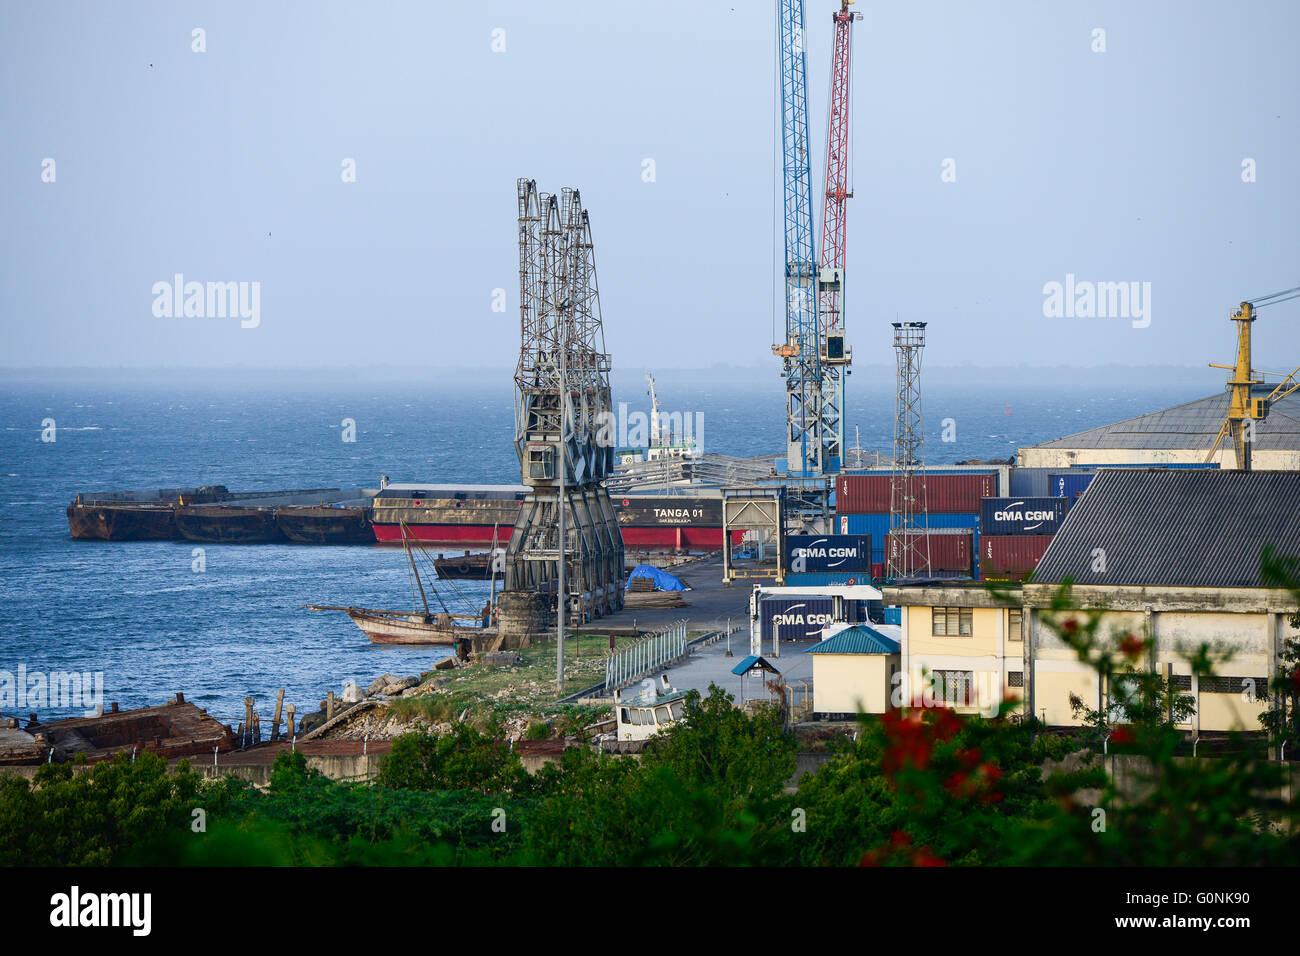 TANZANIA Tanga, sea port at indian ocean Stock Photo - Alamy